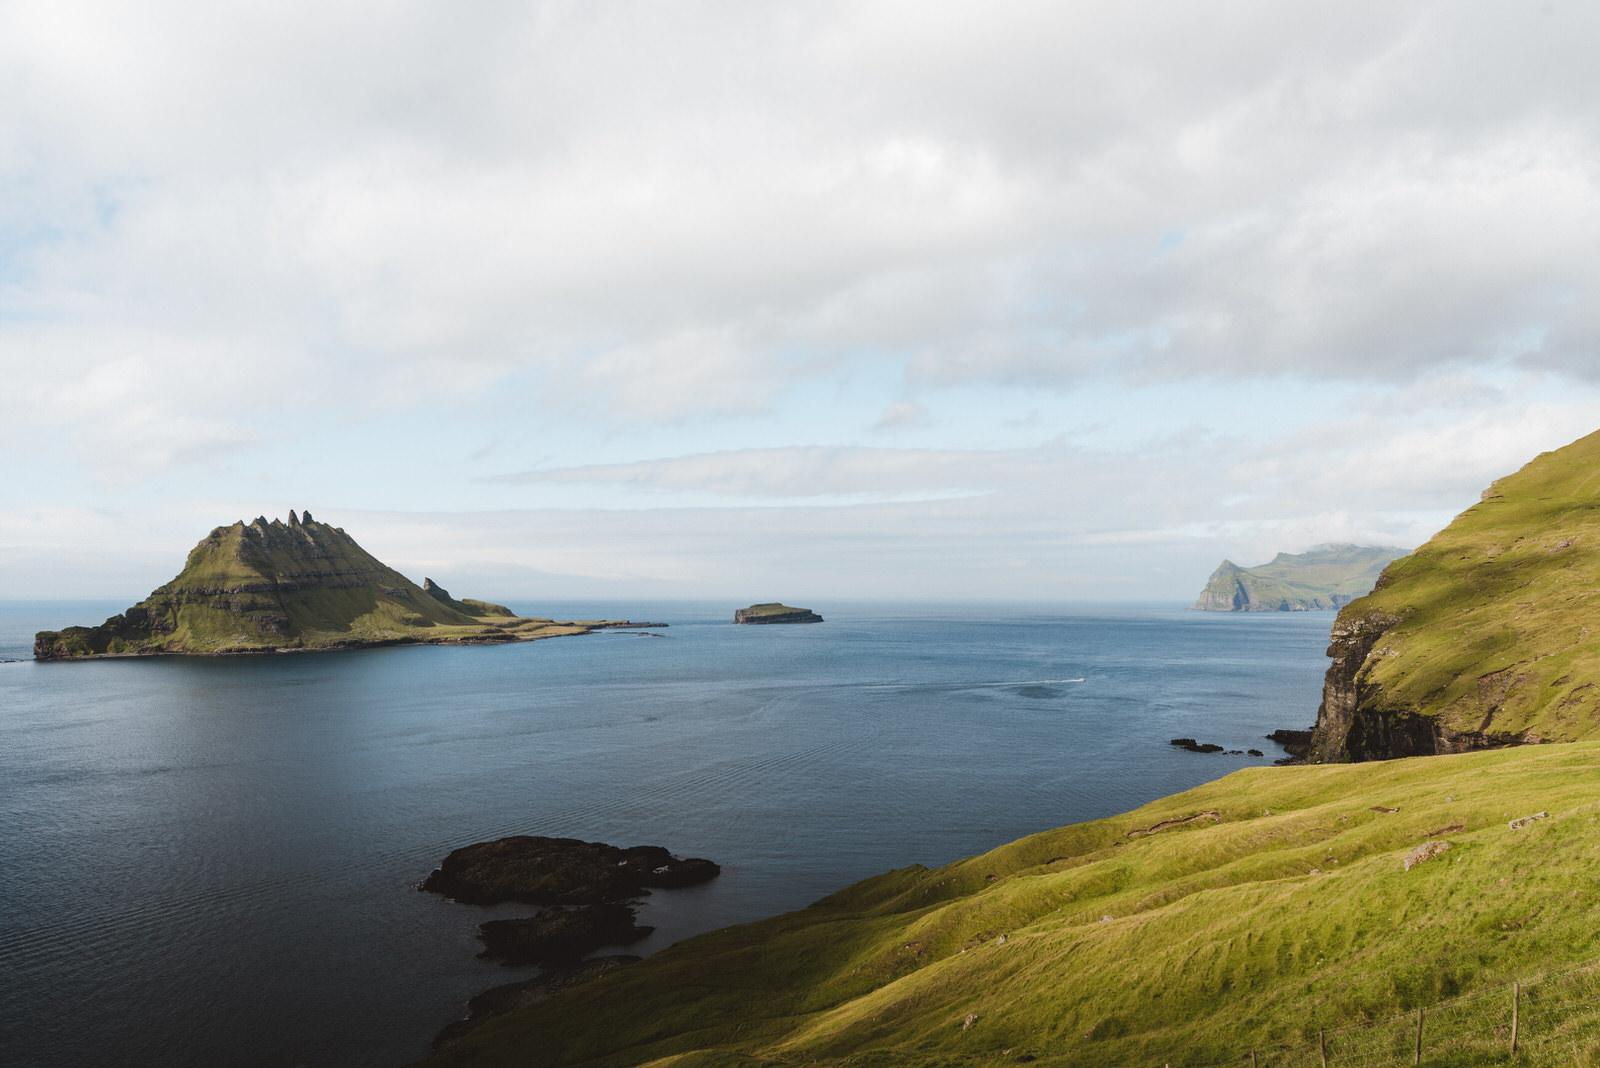 faroe islands road trip 2016 day 8 gasadalur